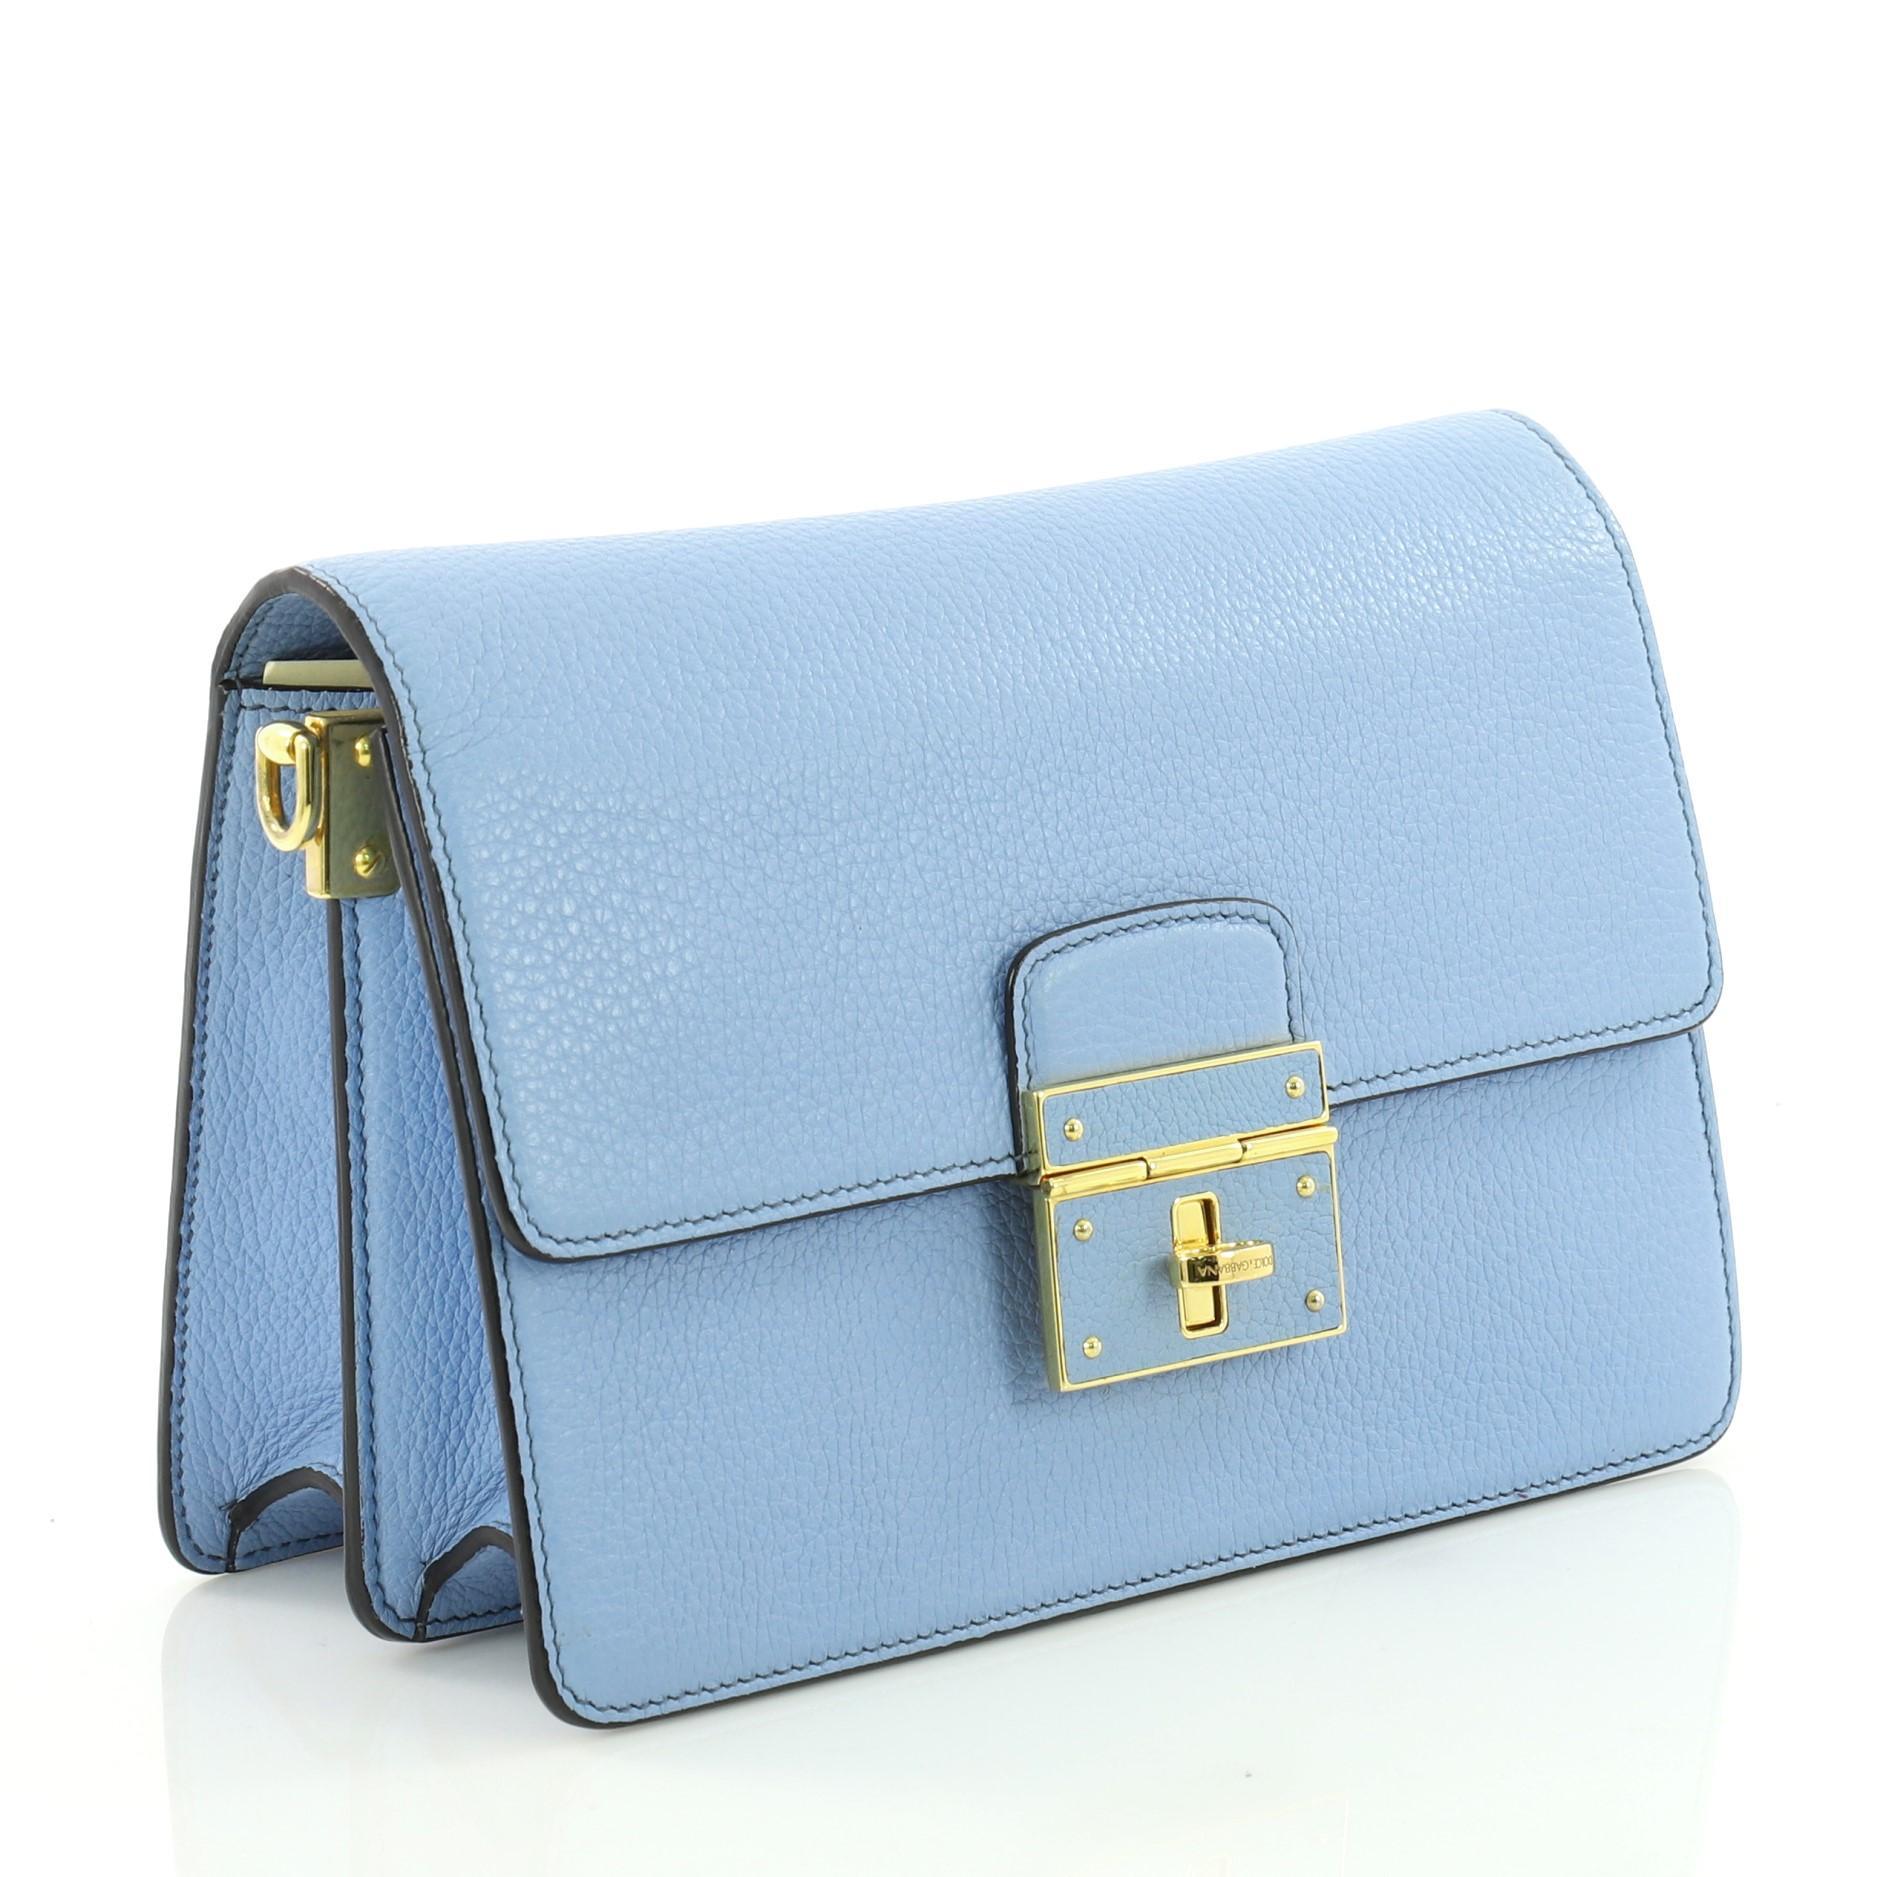 0b8c7c3f6c Dolce and Gabbana Rosalia Shoulder Bag Leather at 1stdibs